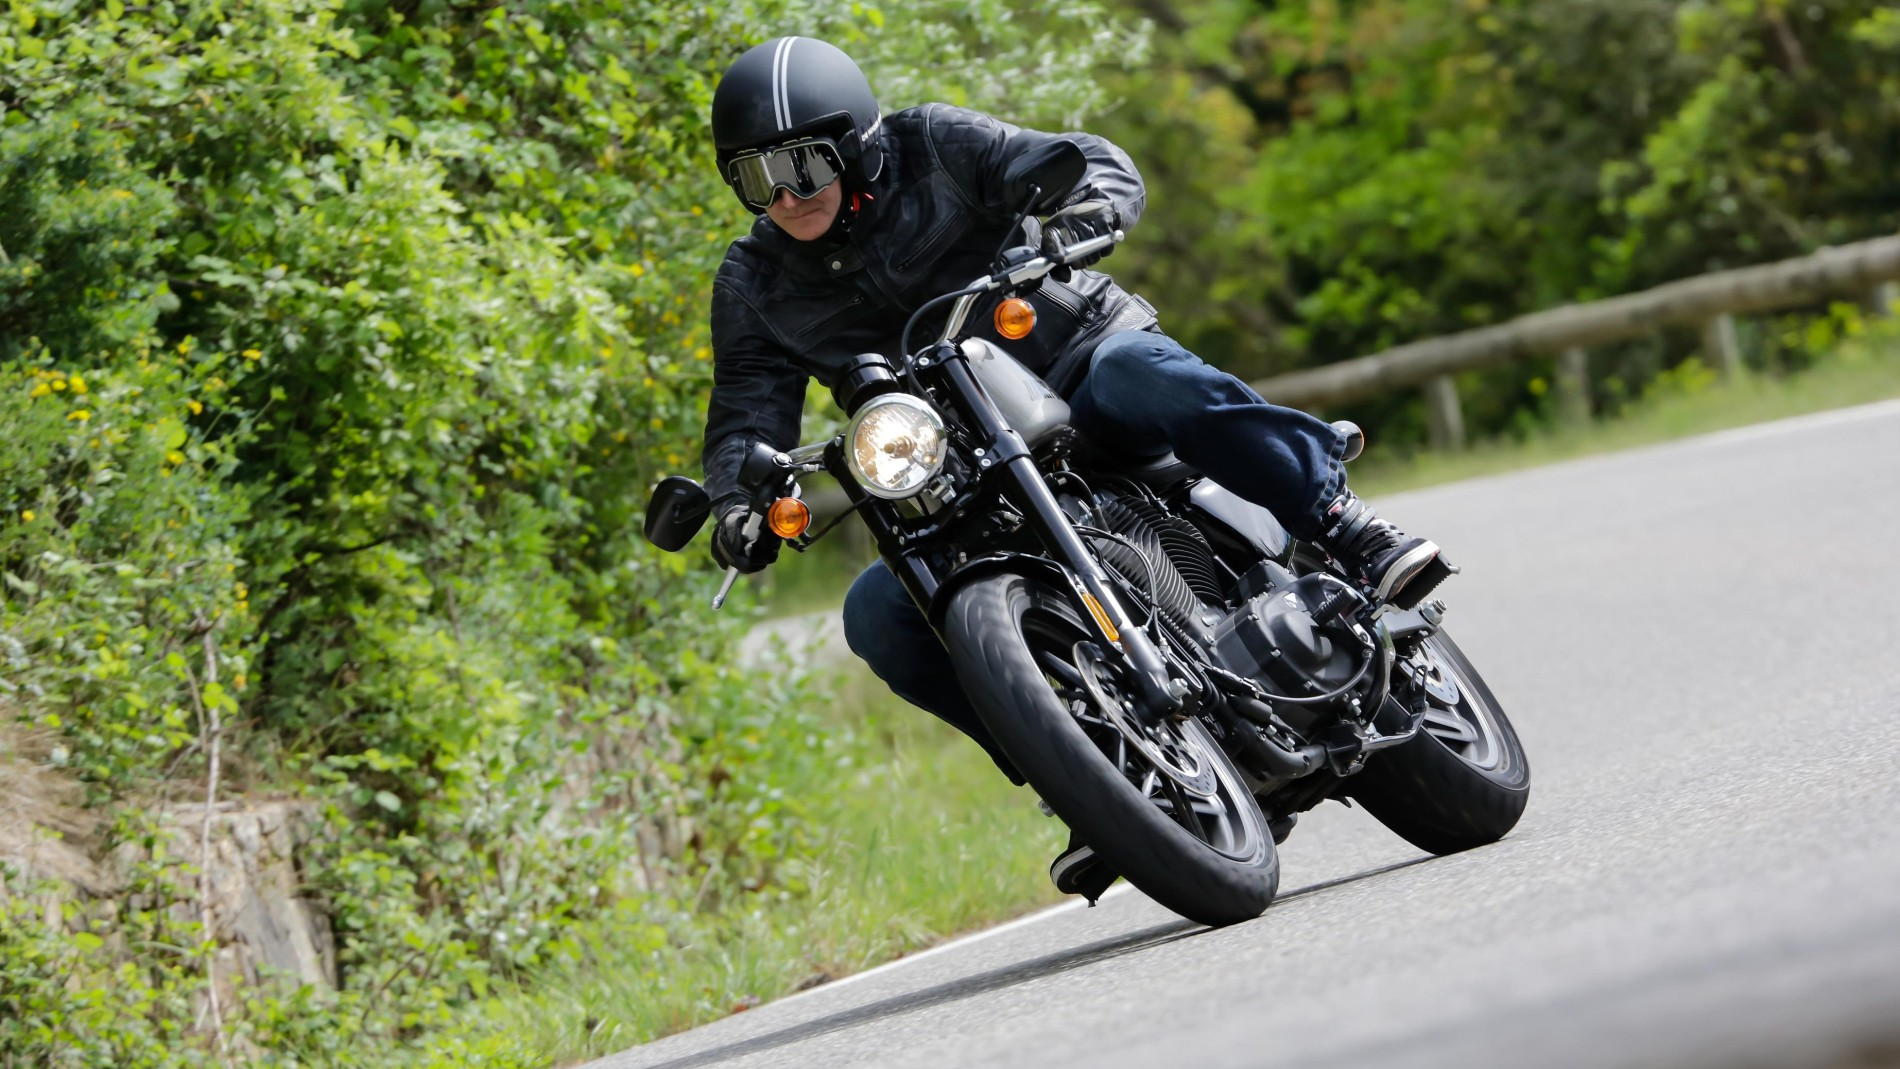 F.A.Z.-Fahrbericht: Harley-Davidson Roadster - Technik & Motor - FAZ